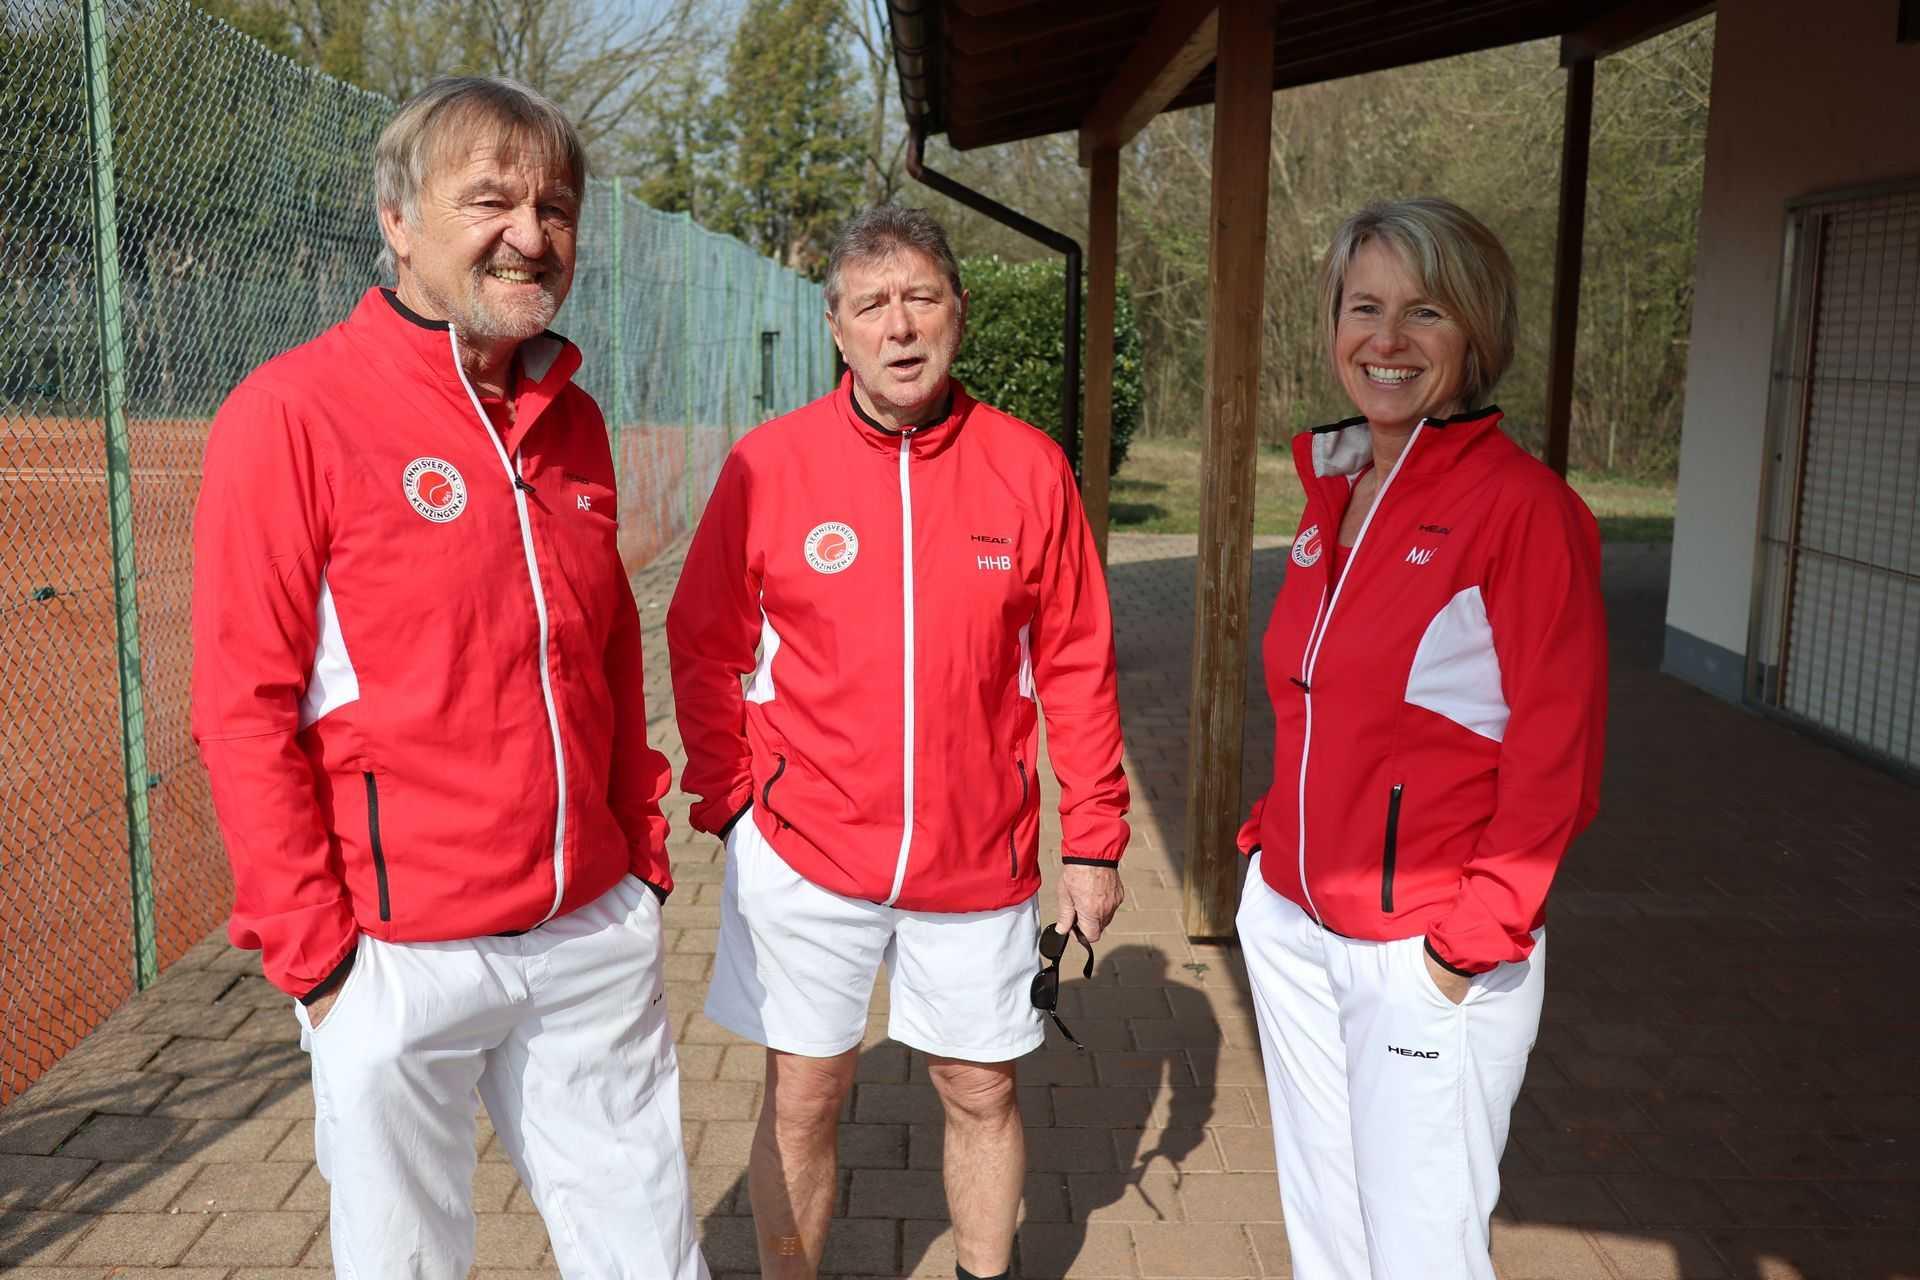 Tennisverein Kenzingen manschafte 27